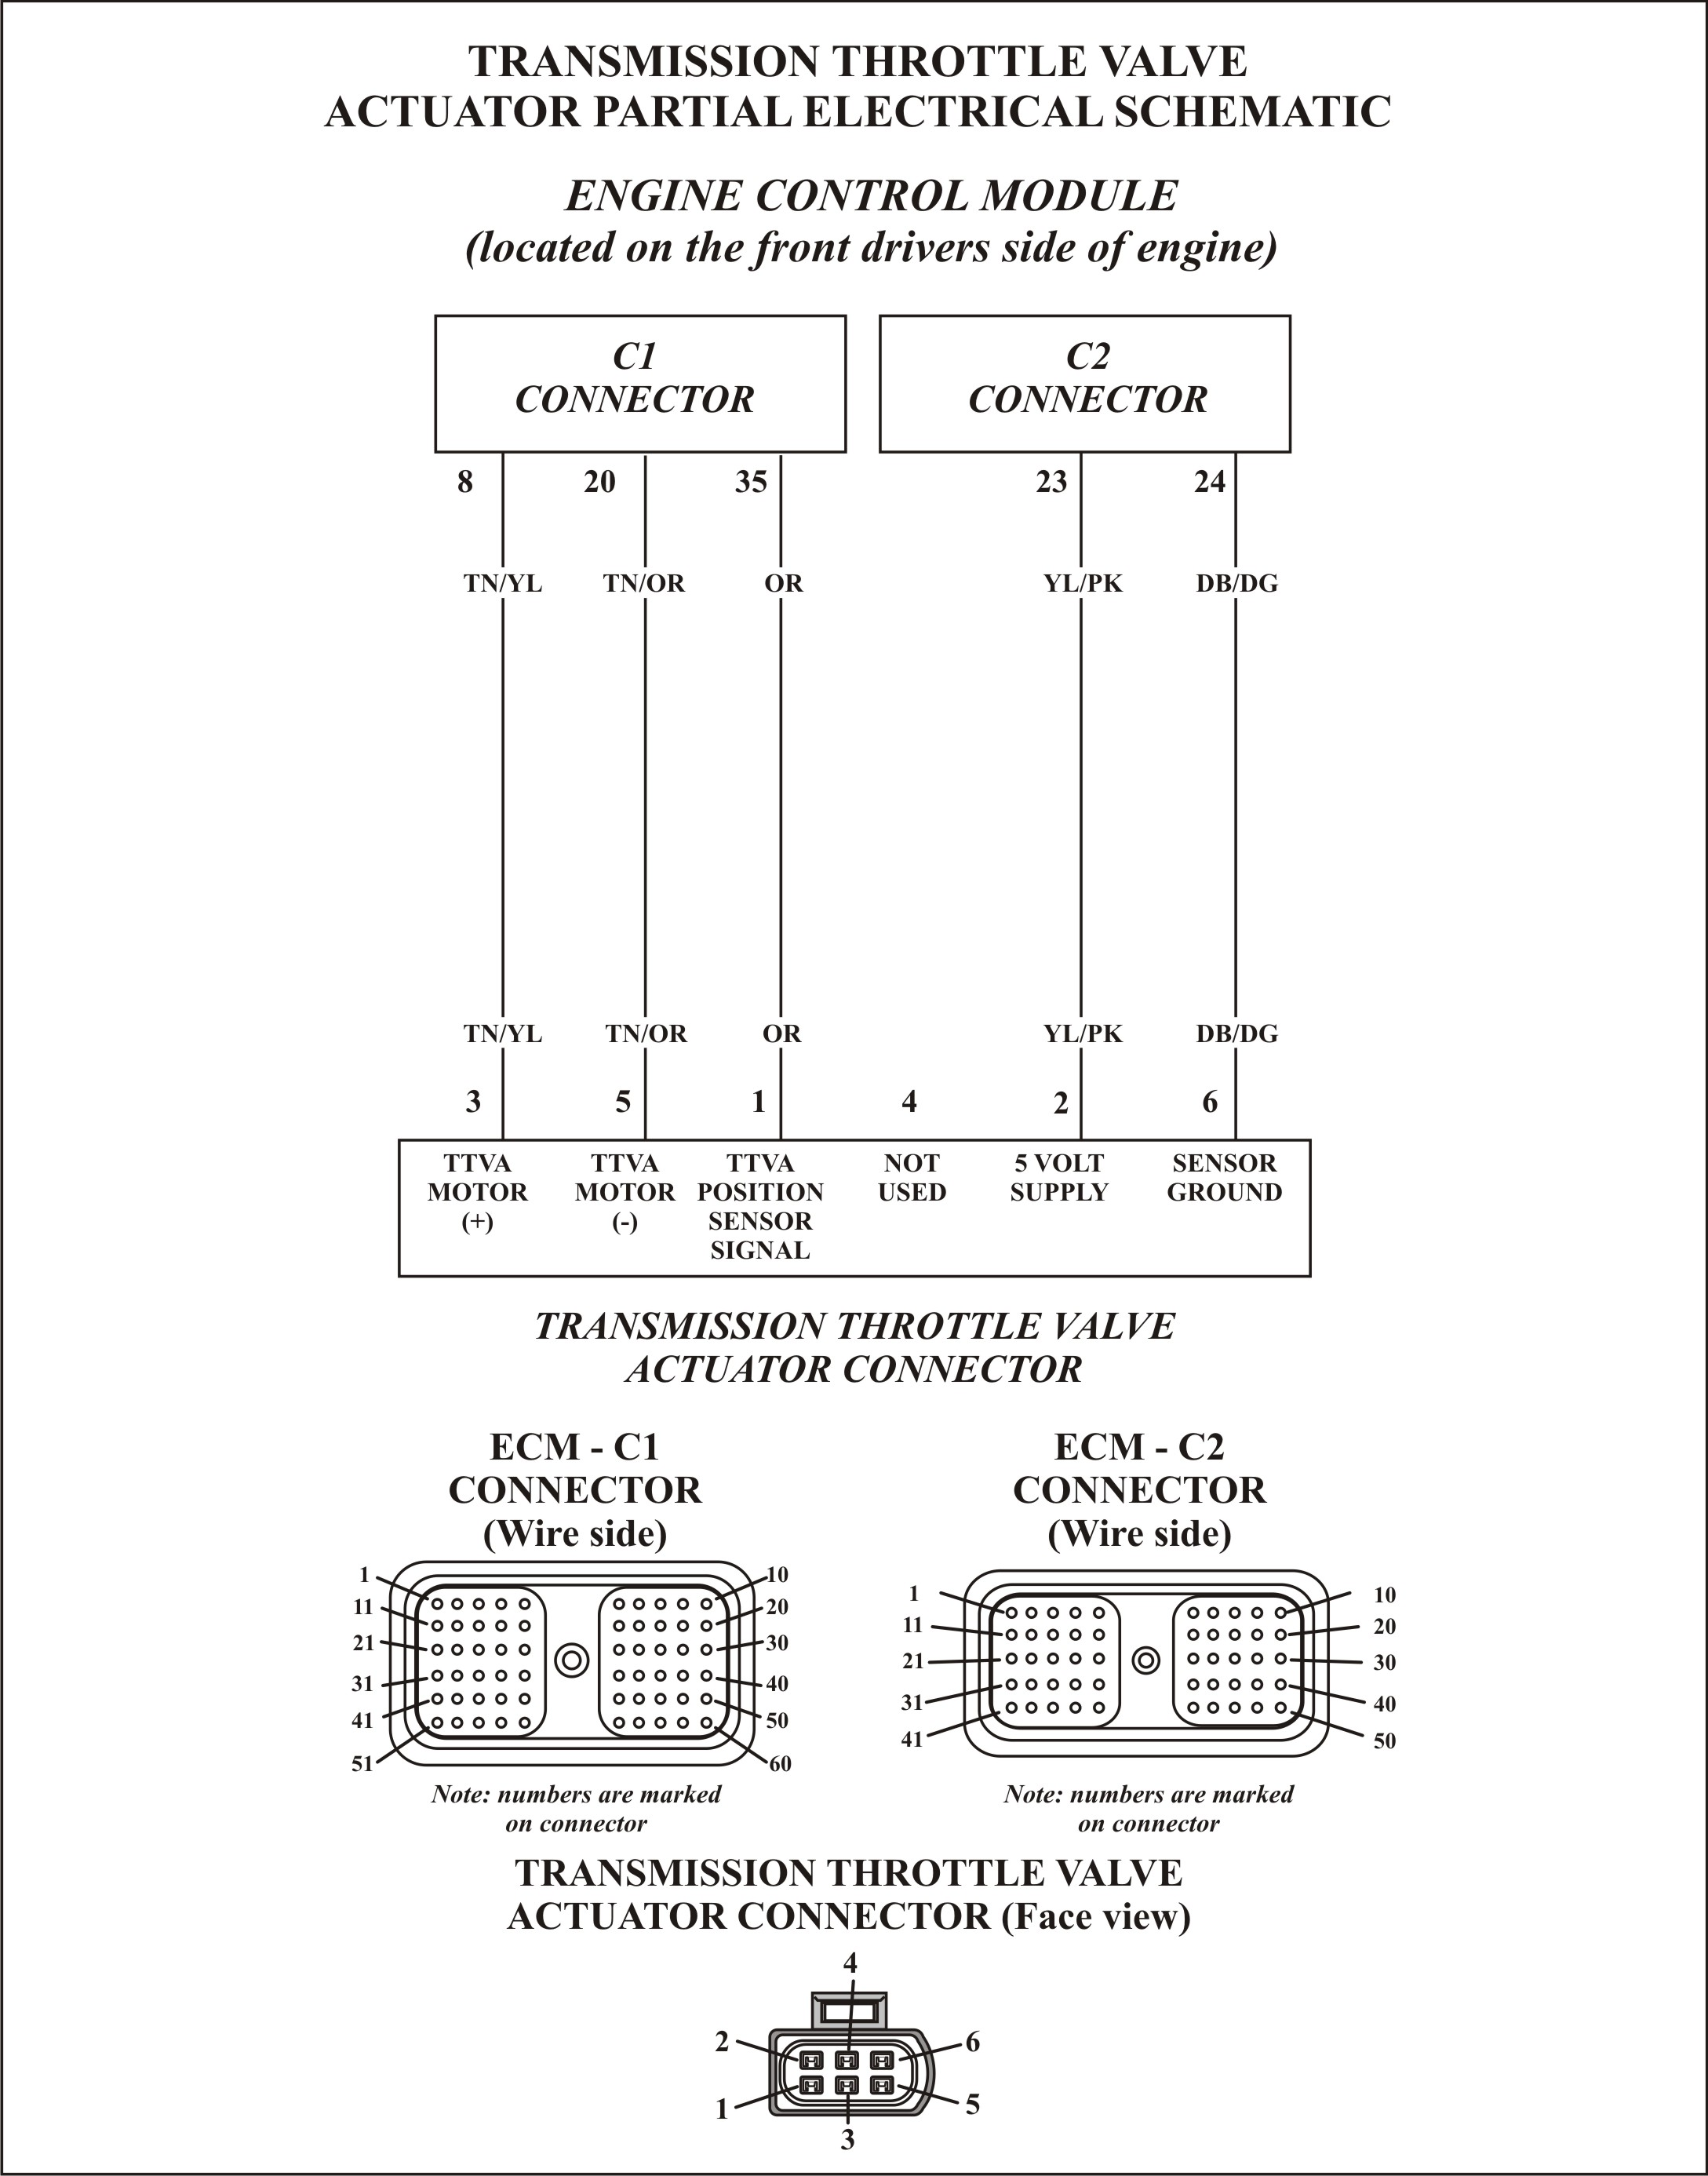 48re transmission repair info diagrams 2007 pontiac g6 engine repair manual diagrams atsg blog - dodge 48re transmission & the parts affected